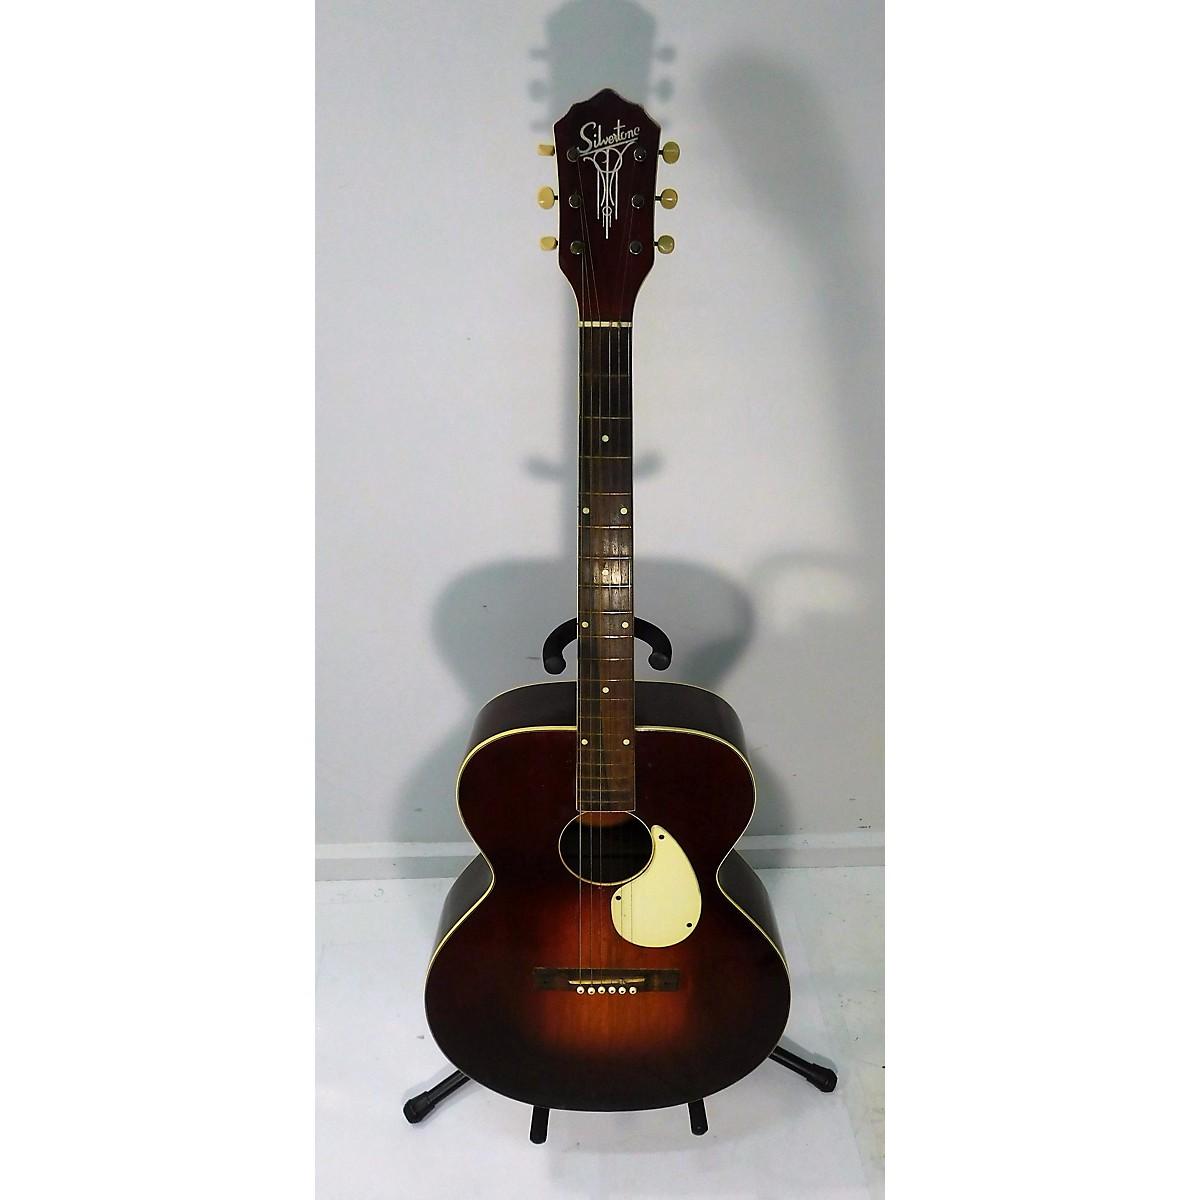 Silvertone 1950s Master Acoustic Guitar